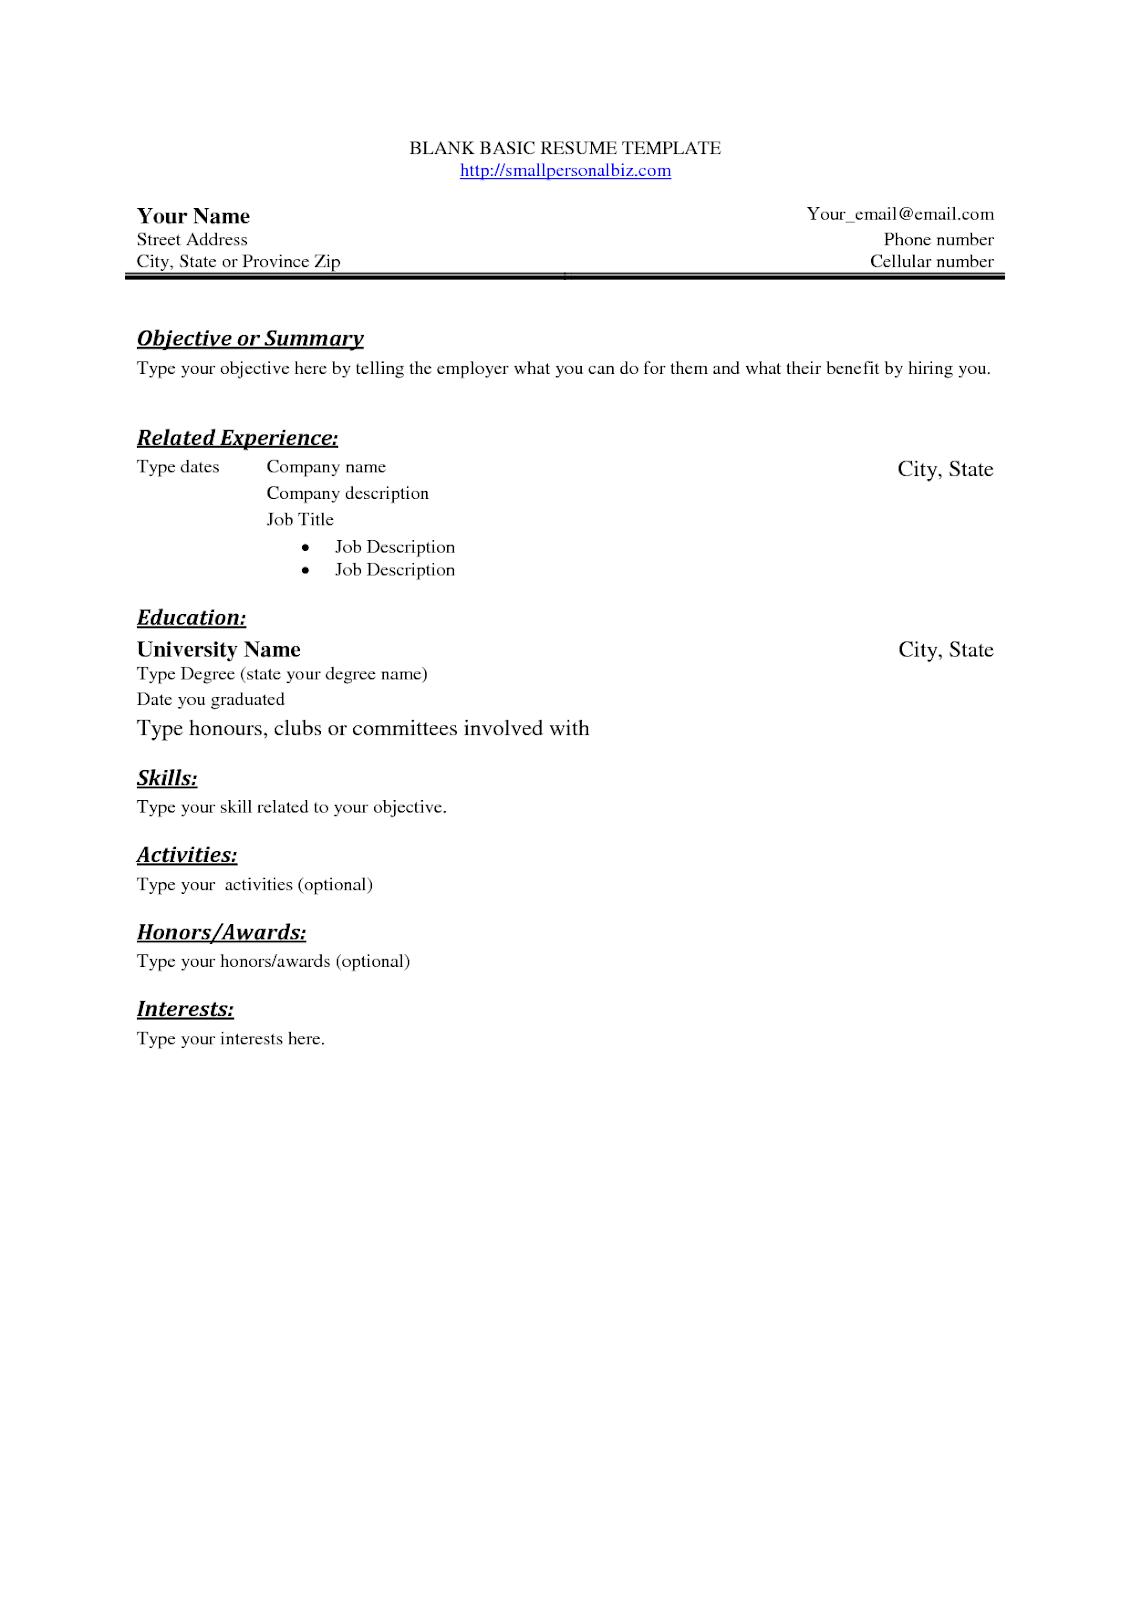 easy resume samples download easy resume samples pdf easy resume sample basic resume examples copy and paste basic resume samples for college students basic resume samples download